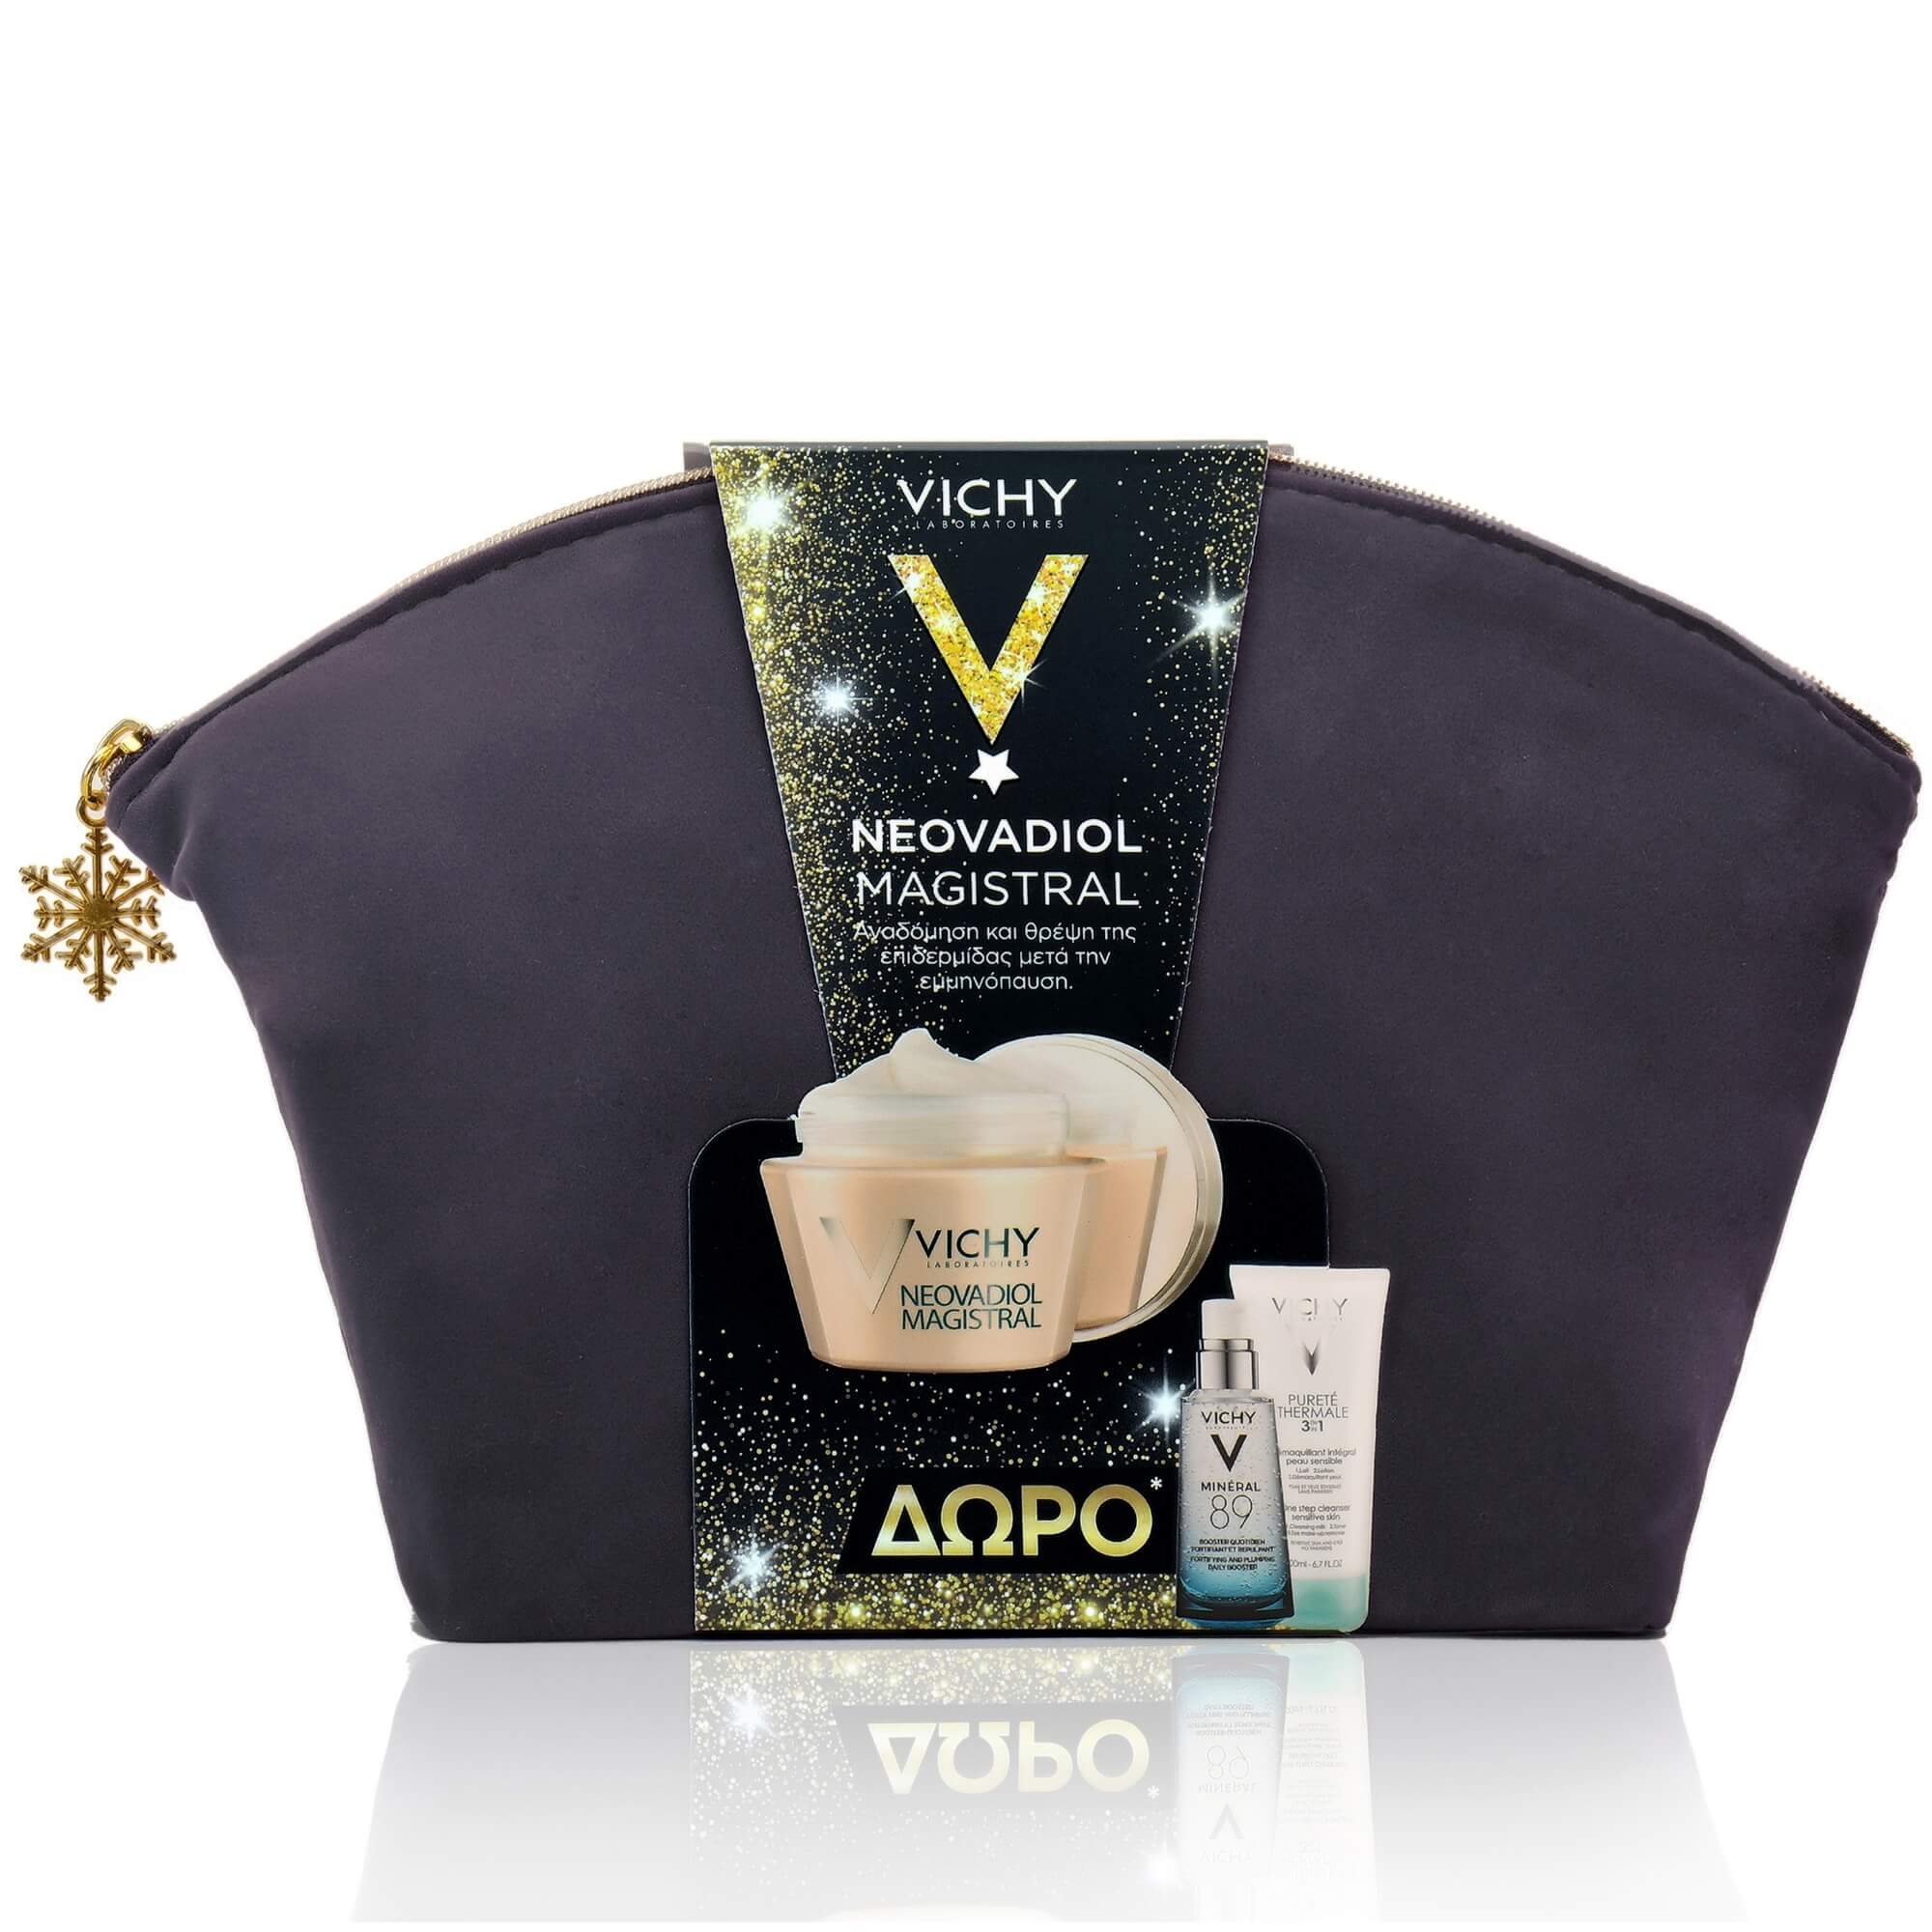 Vichy Πακέτο ΠροσφοράςNeovadiol Magistral50ml& Δώρο Mineral 89 Booster5ml & Purete Thermale 3 in 1 15ml